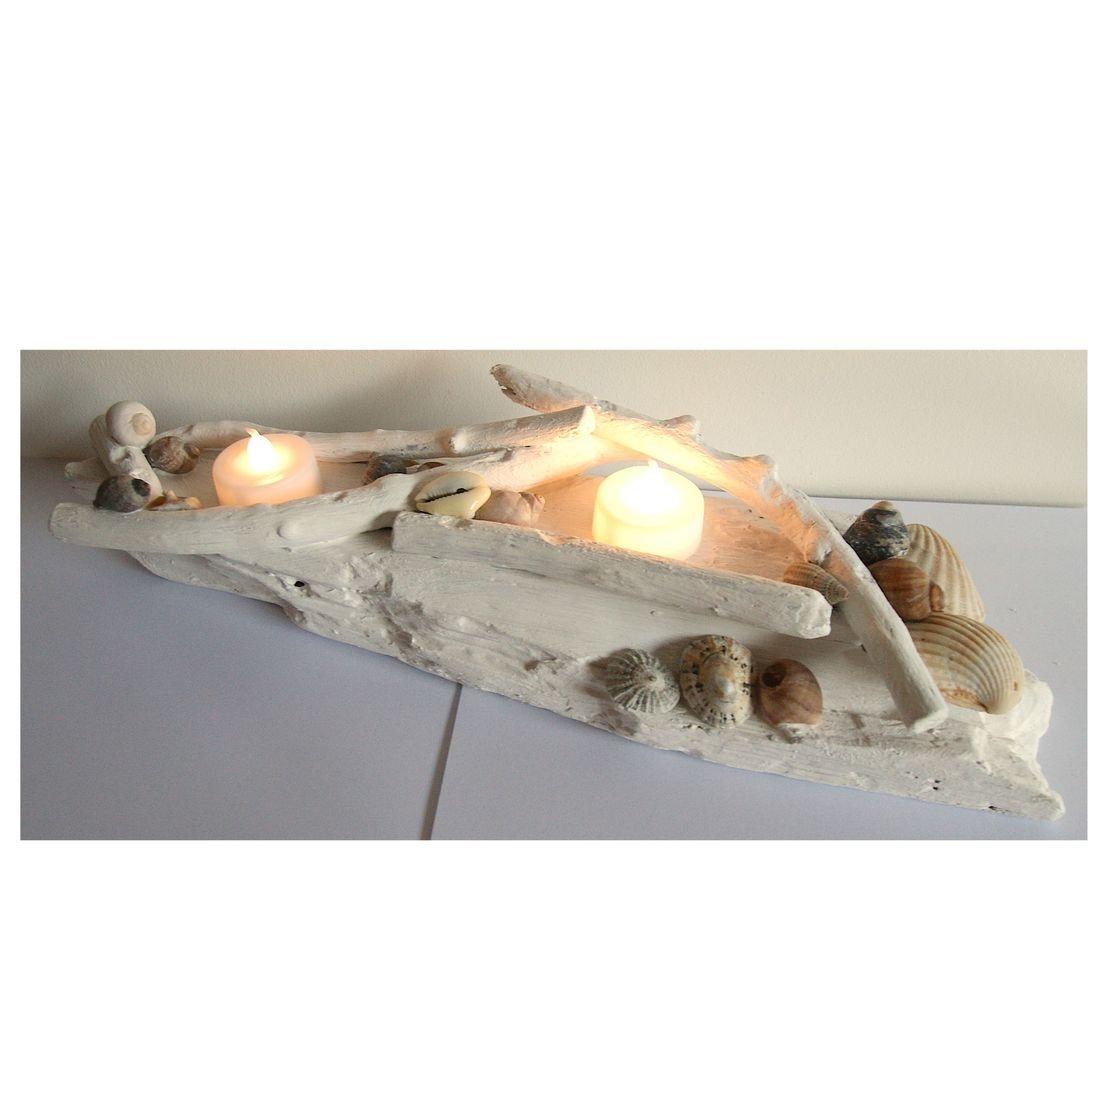 Driftwood large candle tea light holder 6